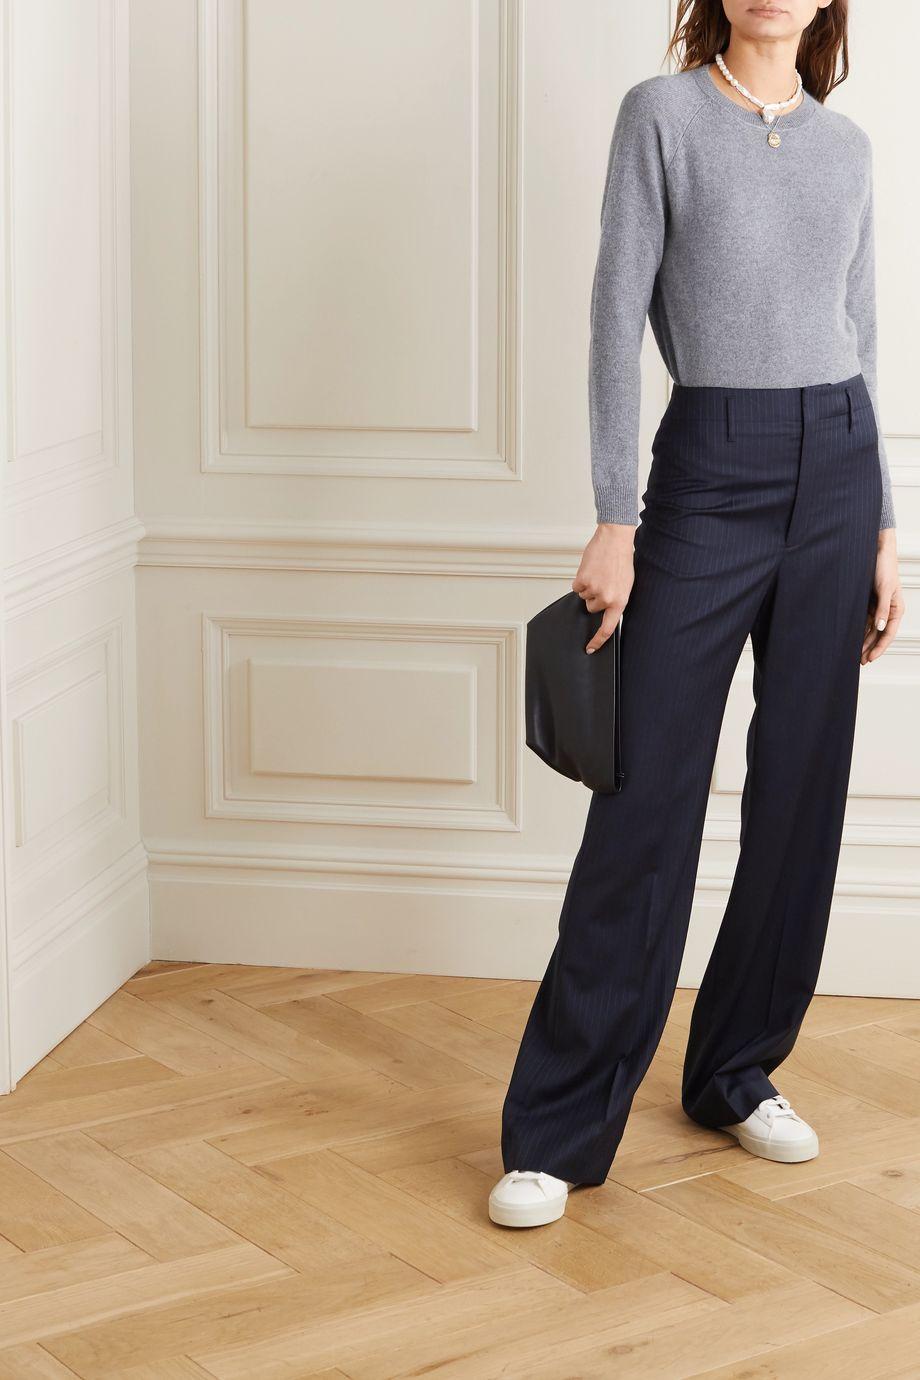 Alexandra Golovanoff Mila mélange cashmere sweater